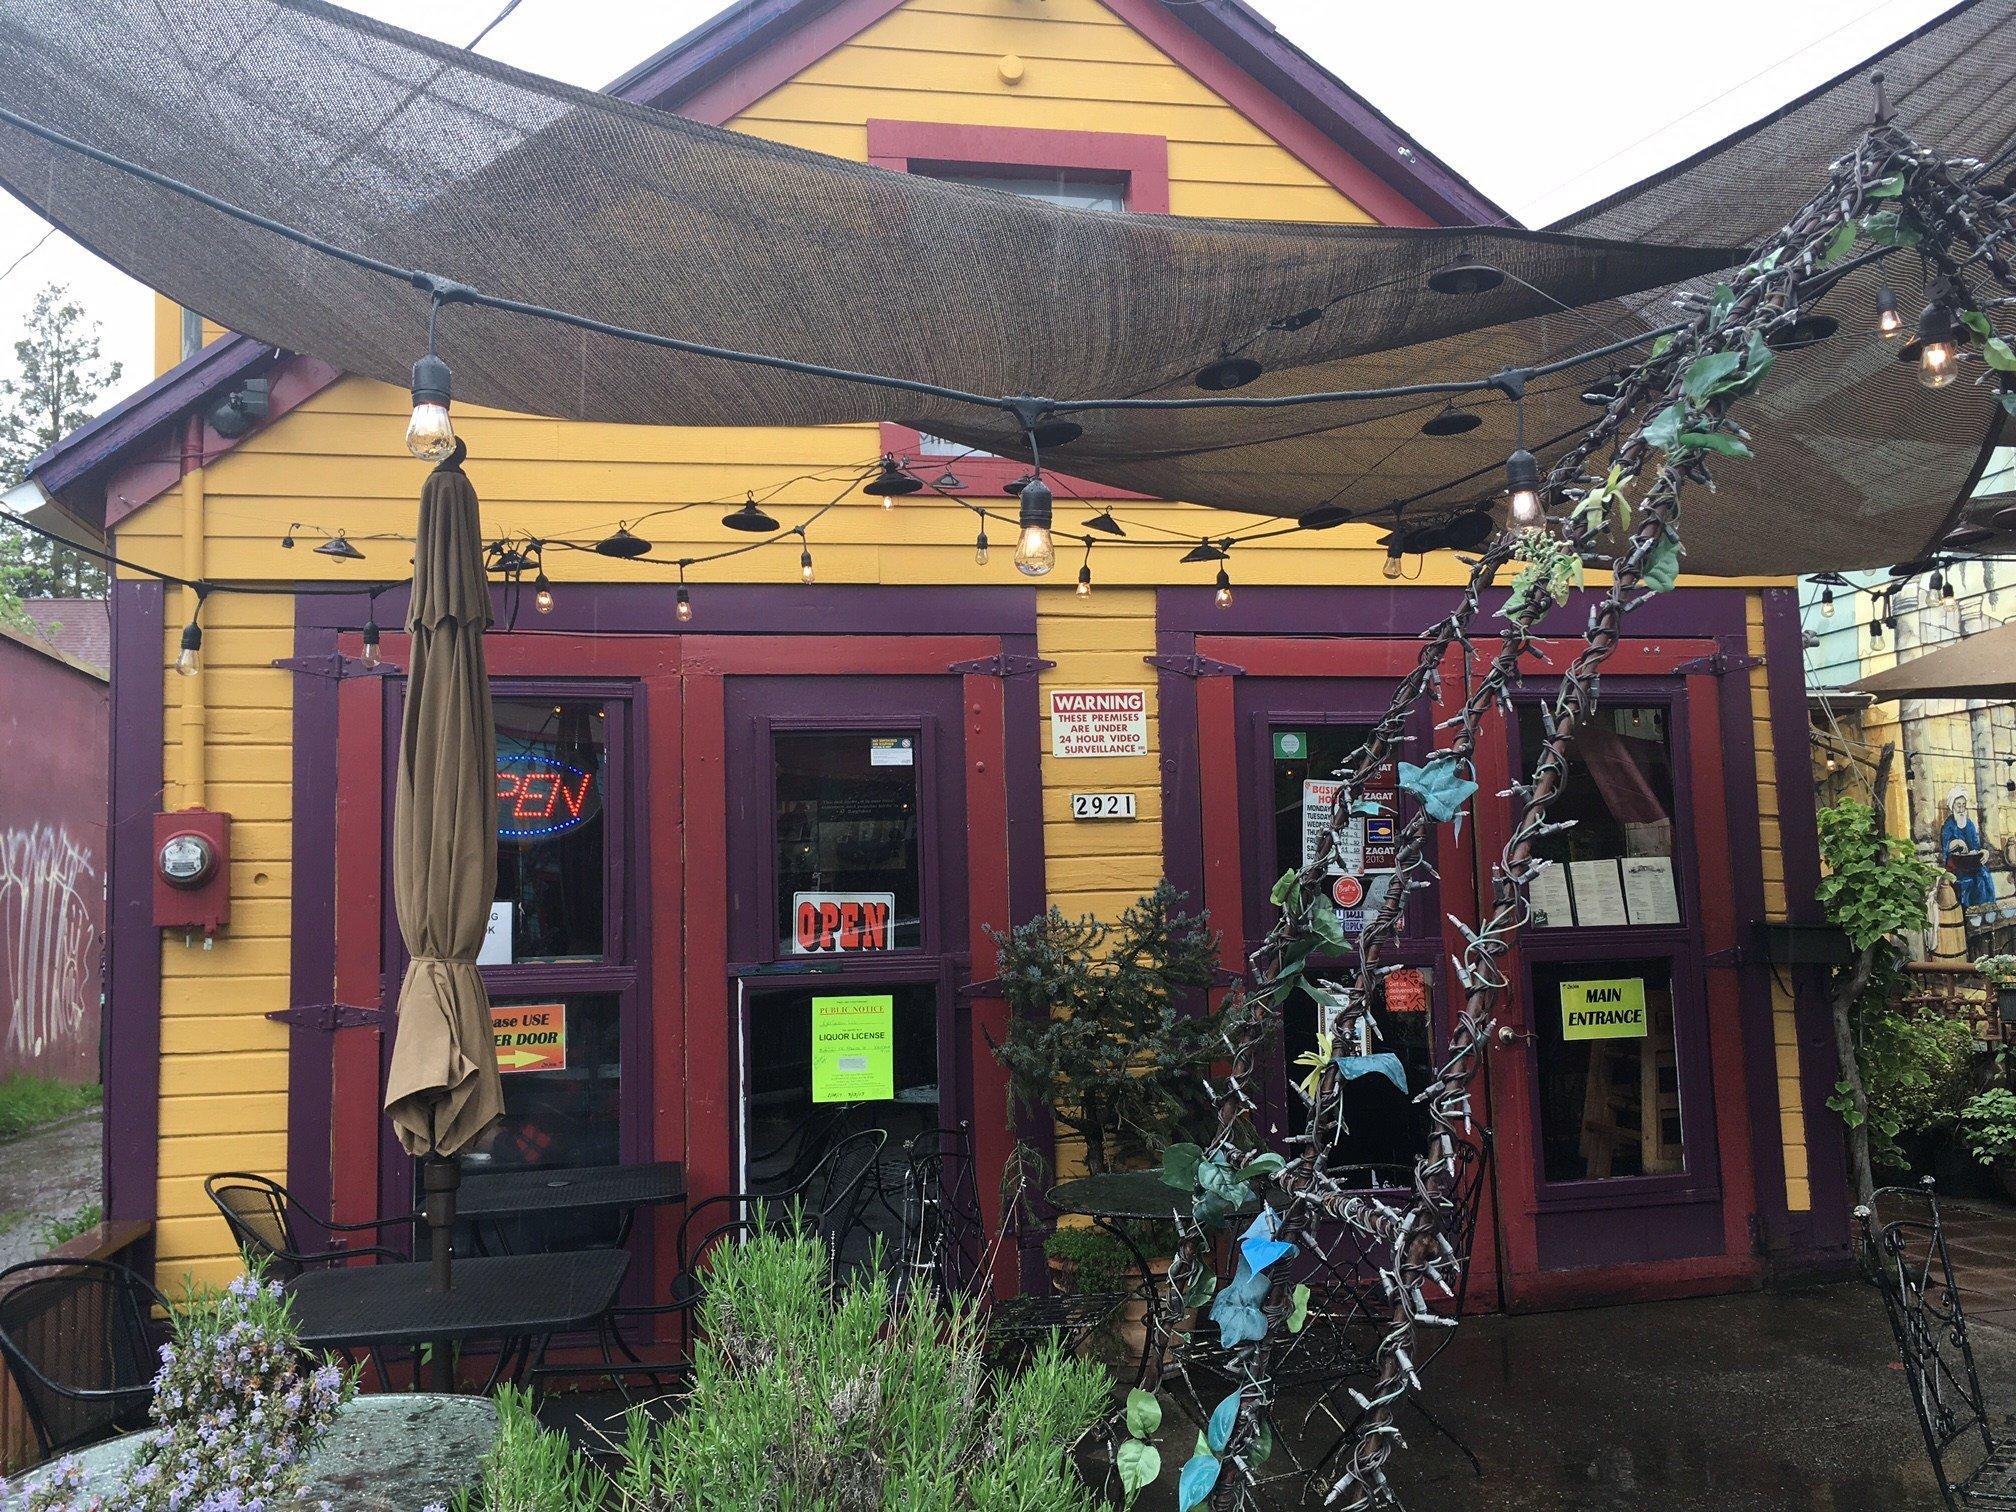 The DarSalam restaurant on Northeast Alberta. (KPTV)